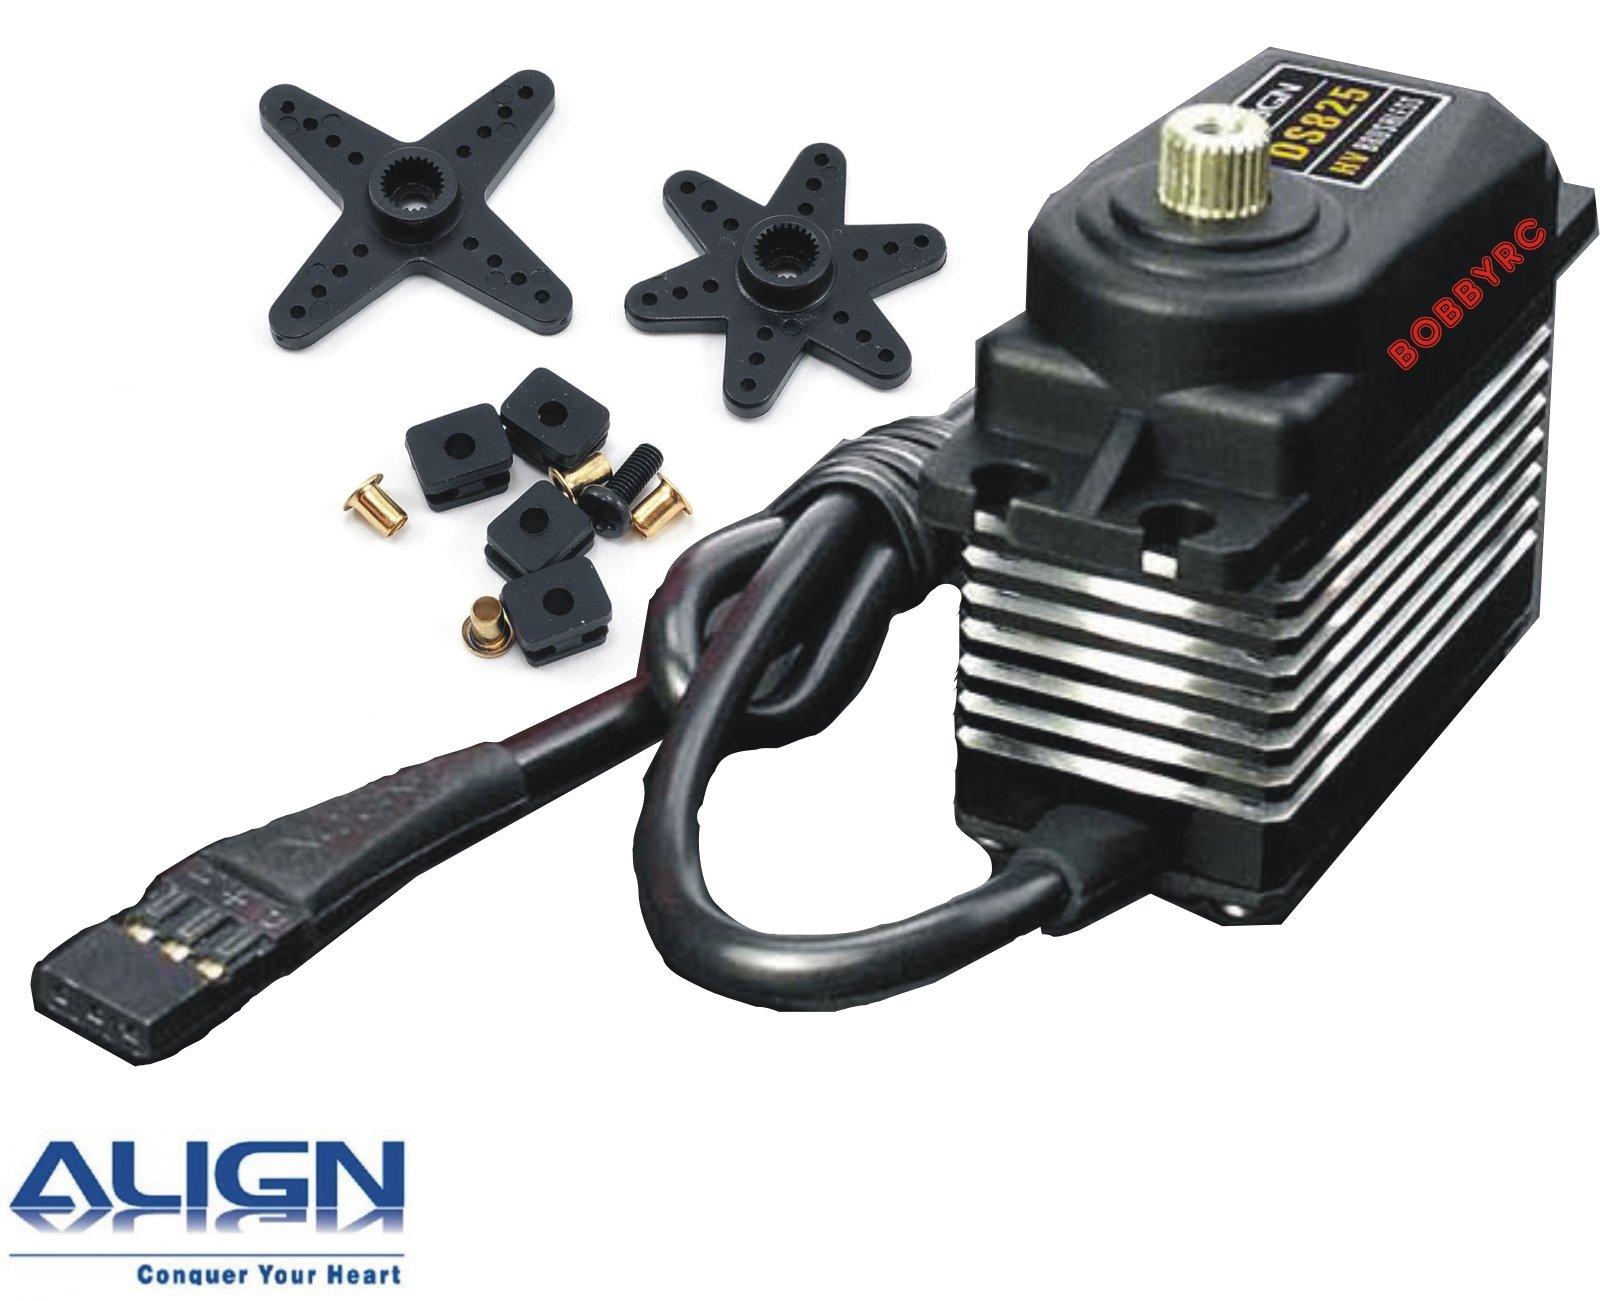 Align Trex 550 600 700 Tail DS825M High Voltage Brushless Digital Servo HSD82501